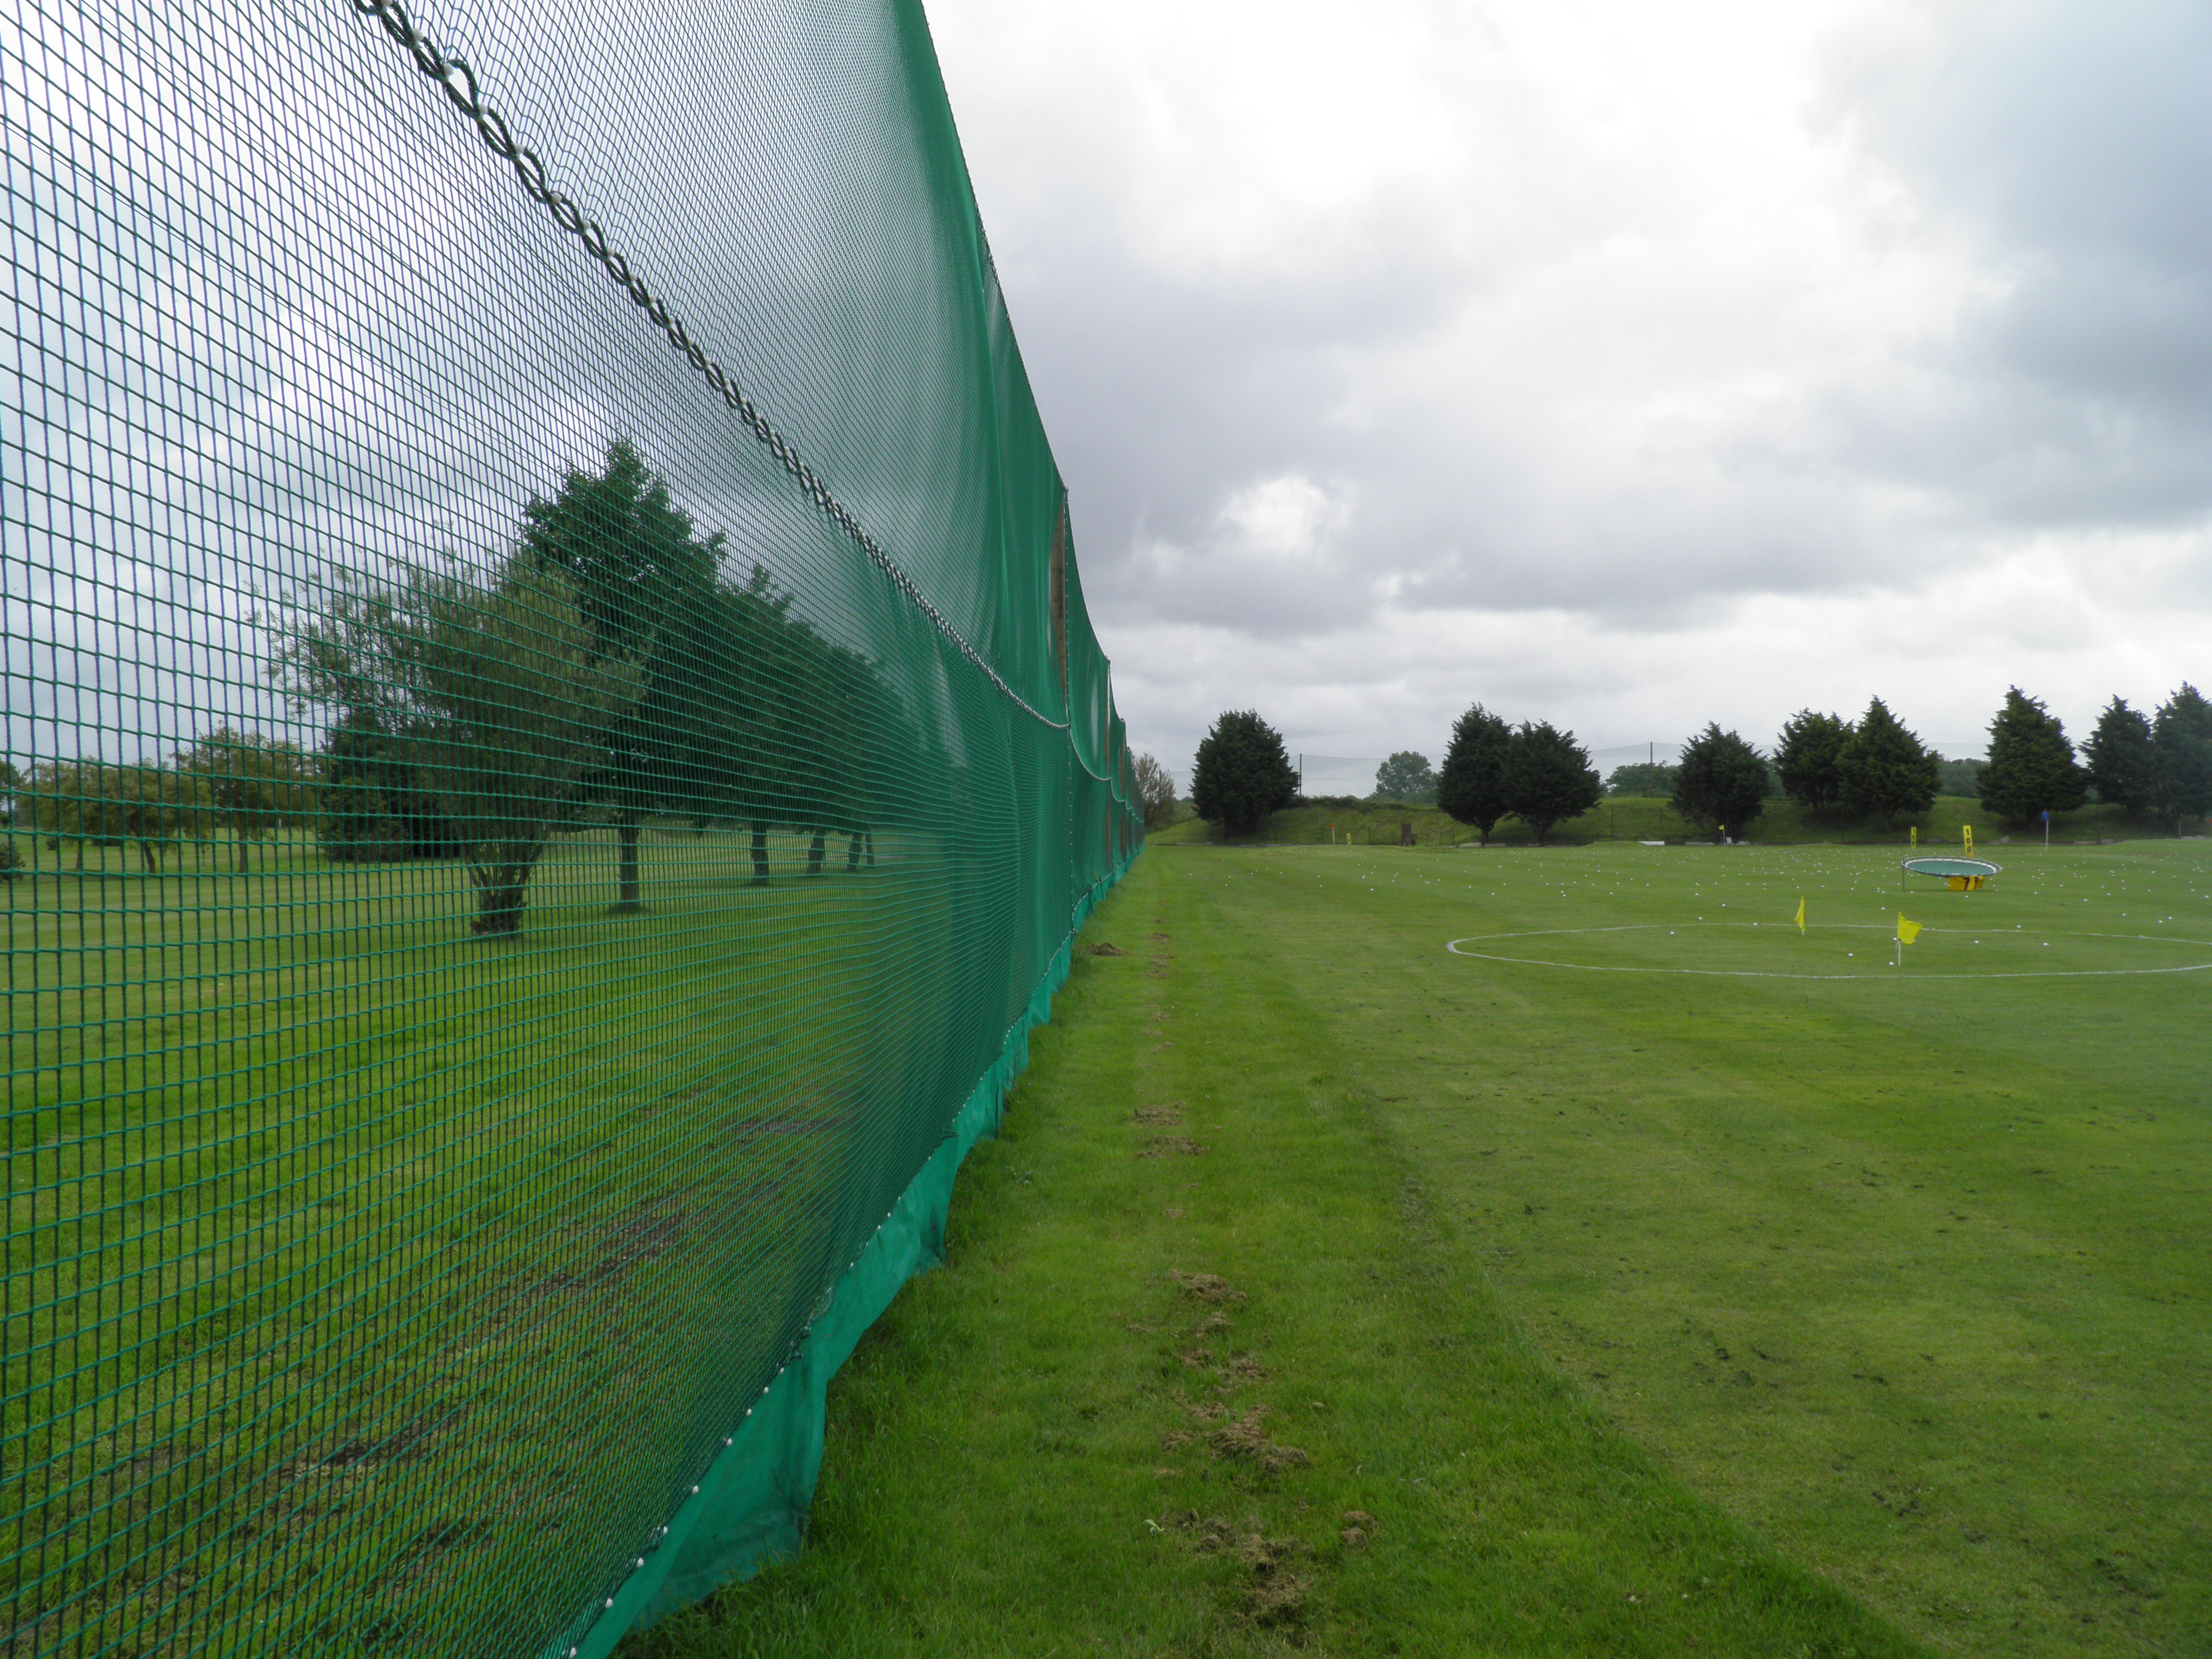 Golf Driving Range Netting Installations Huck